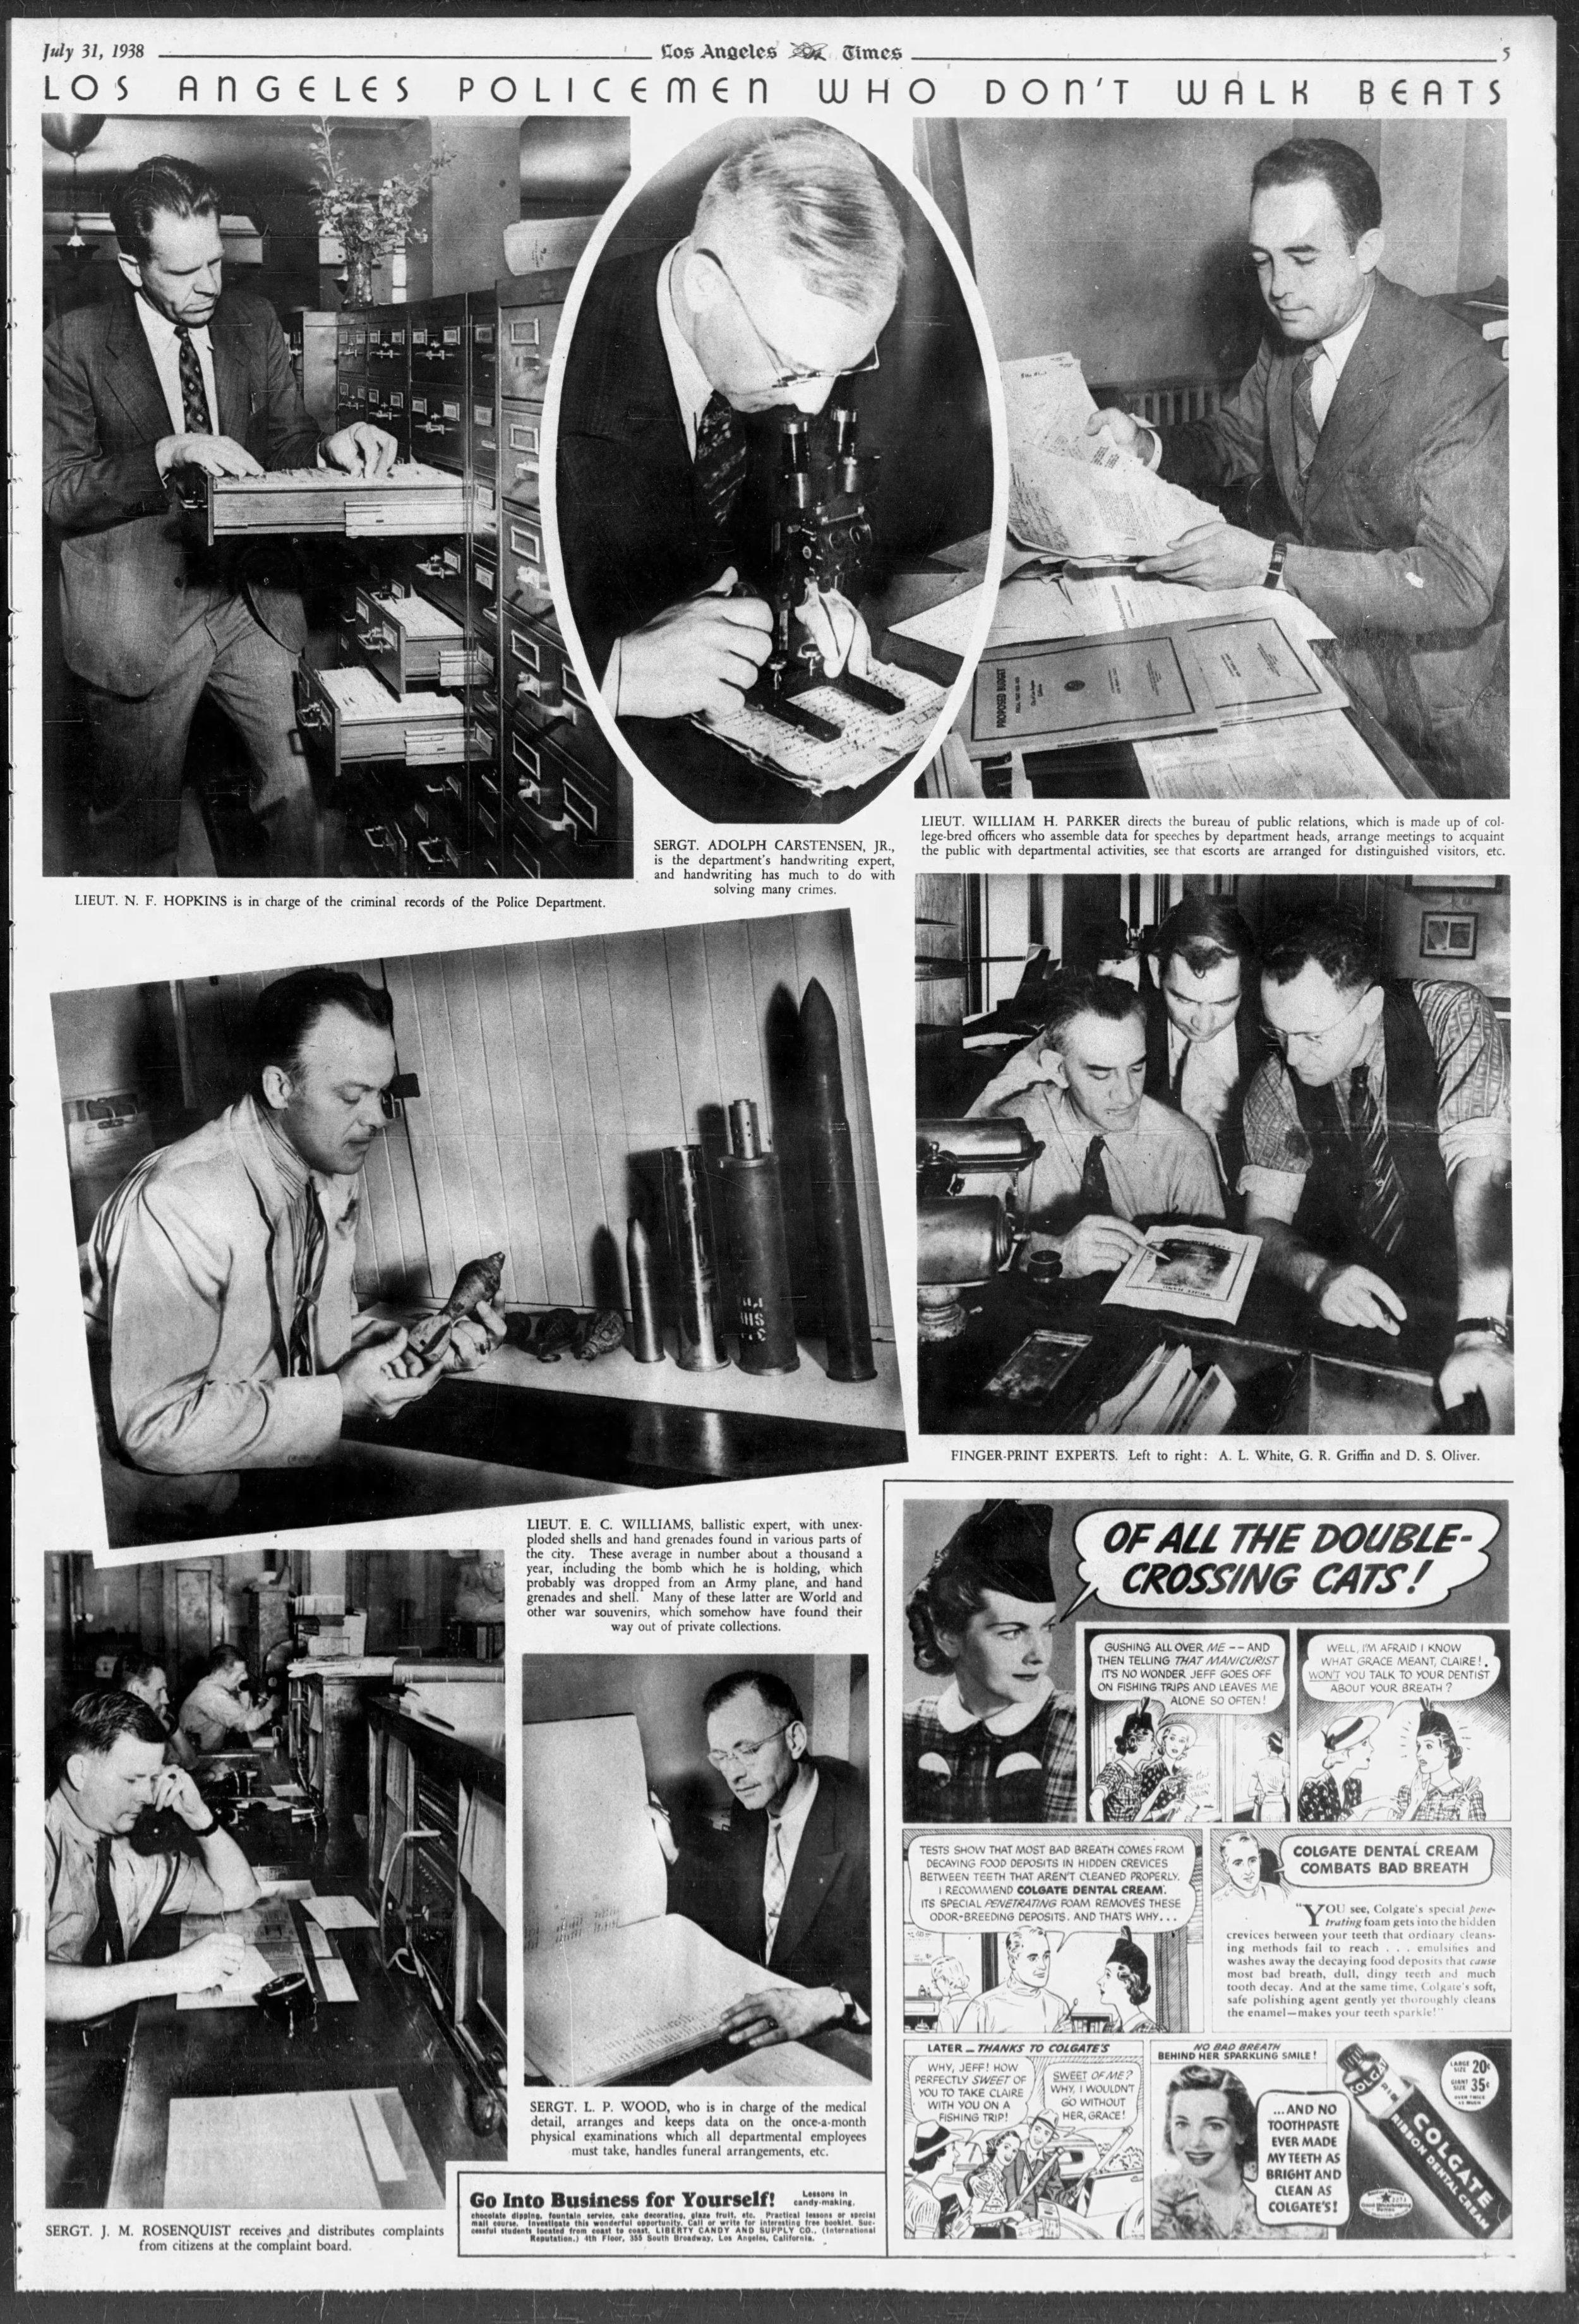 The_Los_Angeles_Times_Sun__Jul_31__1938_.jpg